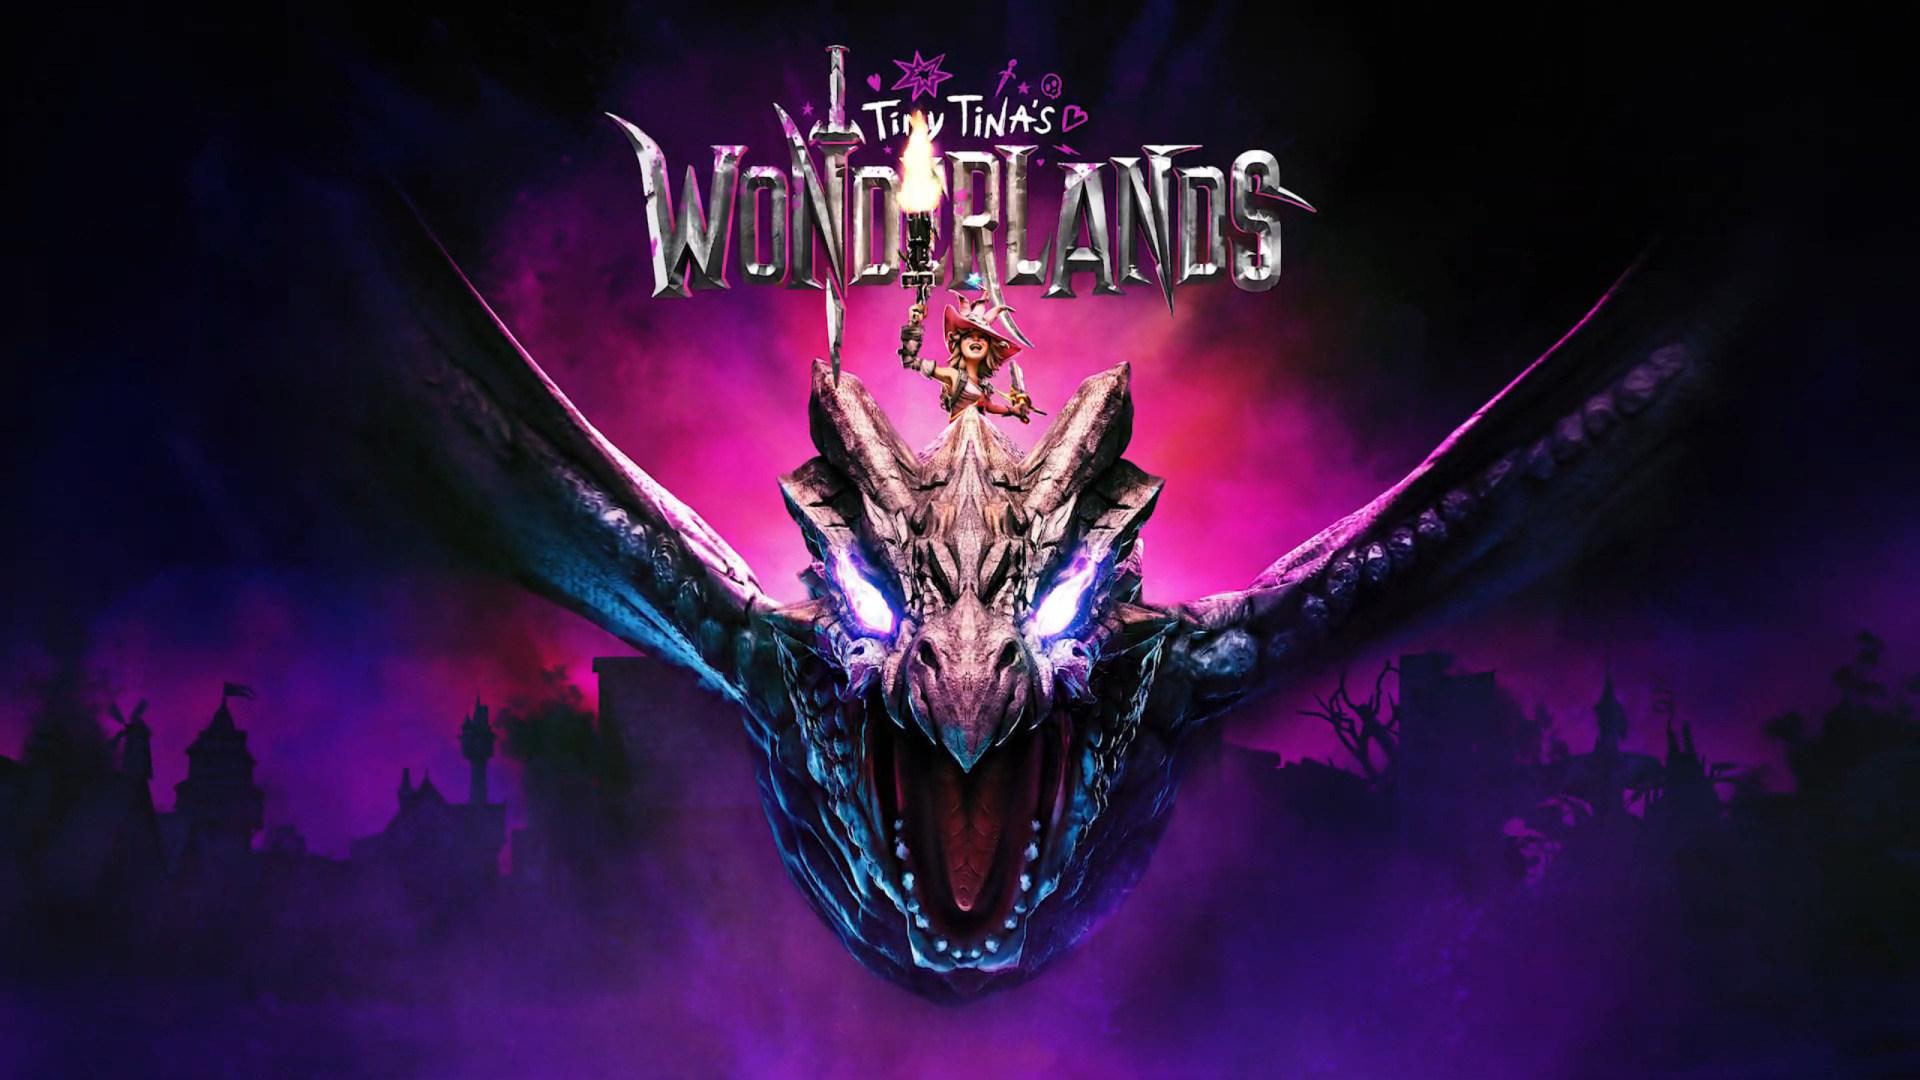 Trailer, E3, Teaser, 2K Games, Gearbox, Borderlands, Gearbox Software, E3 2021, Tiny Tina's Wonderlands, Summer Game Fest, Summer Game Fest 2021